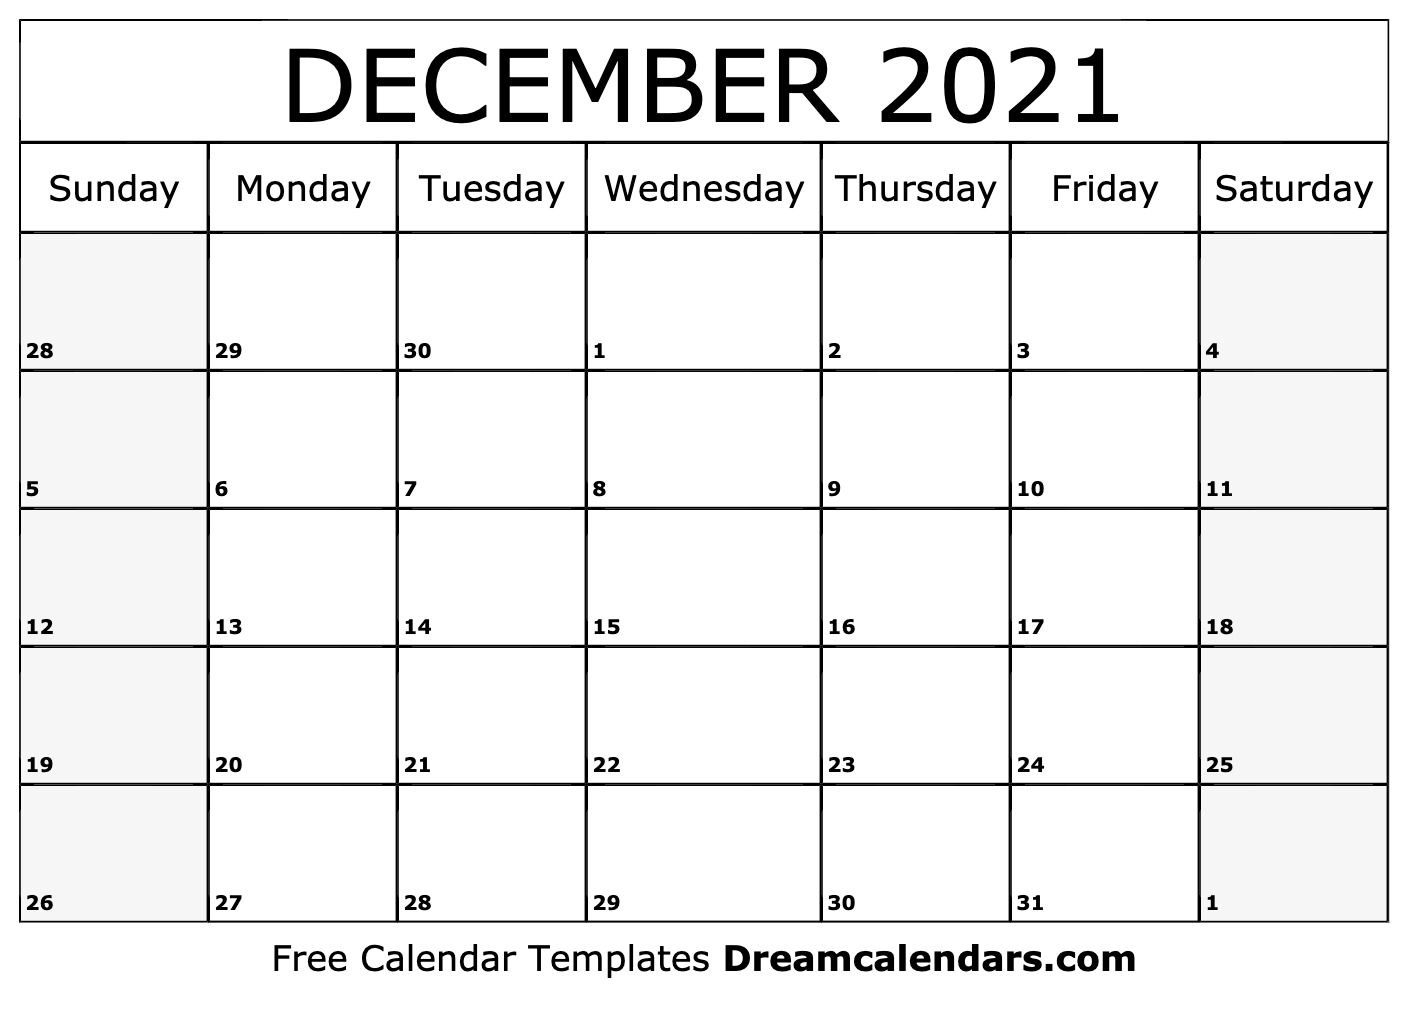 December 2021 Calendar | Free Blank Printable Templates